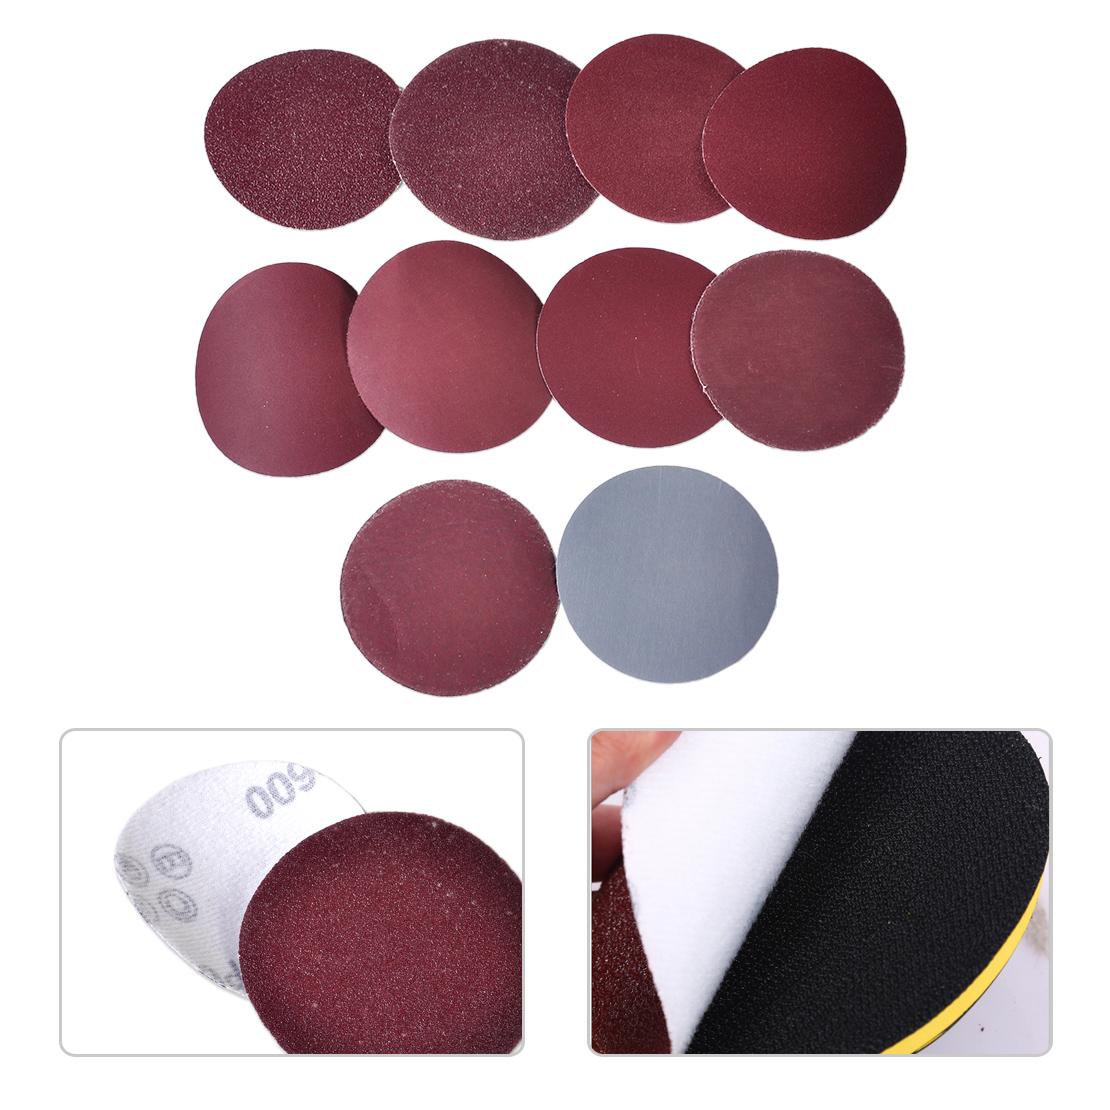 Details about  /Mix set 7 inch Sanding Disc Sanding Pad Polishing Pad Sandpaper 100pcs 180mm